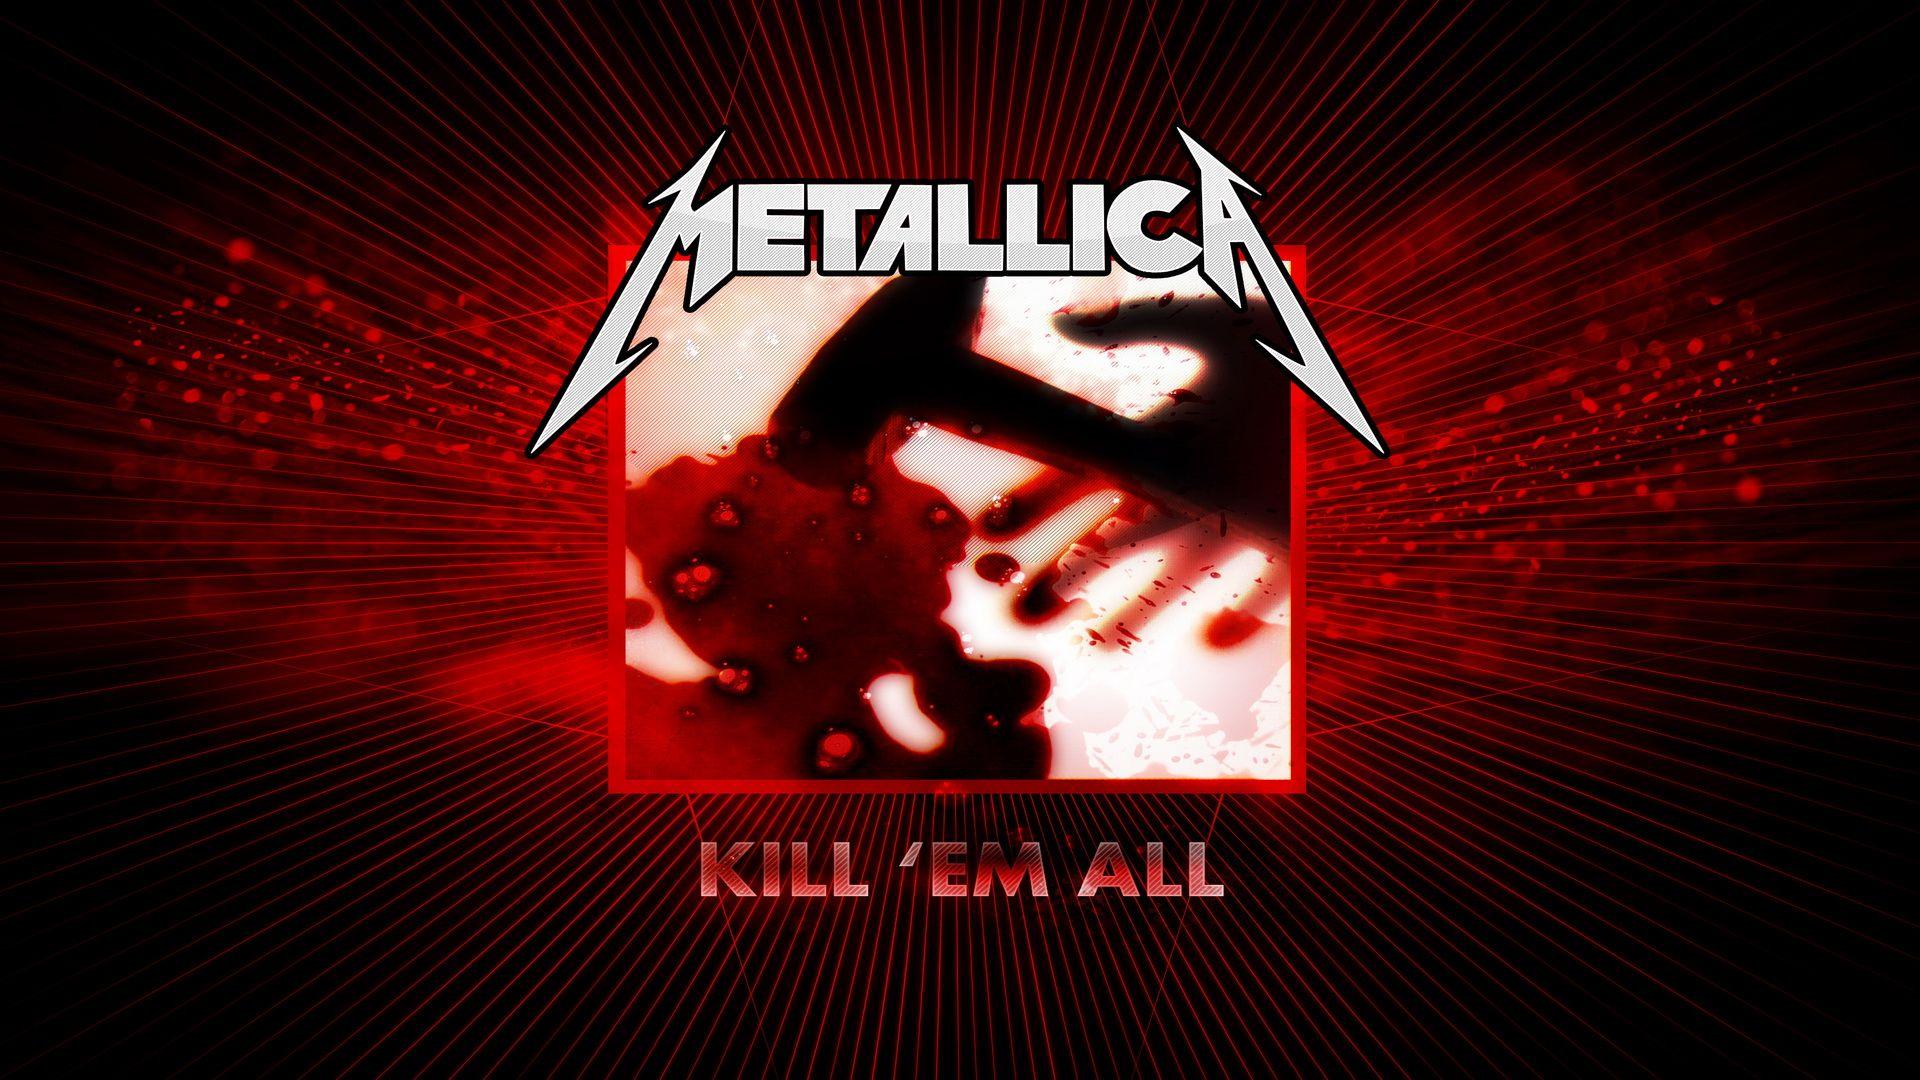 Metallica Wallpapers 7 1920x1080 Metallica Albums Metallica Metallica Cover